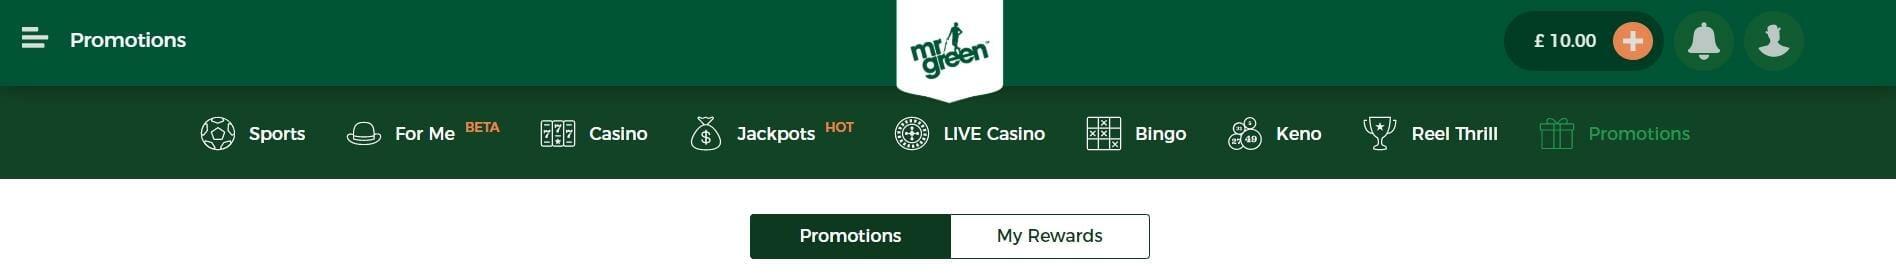 Mr Green Promotions button under site's main navigation bar